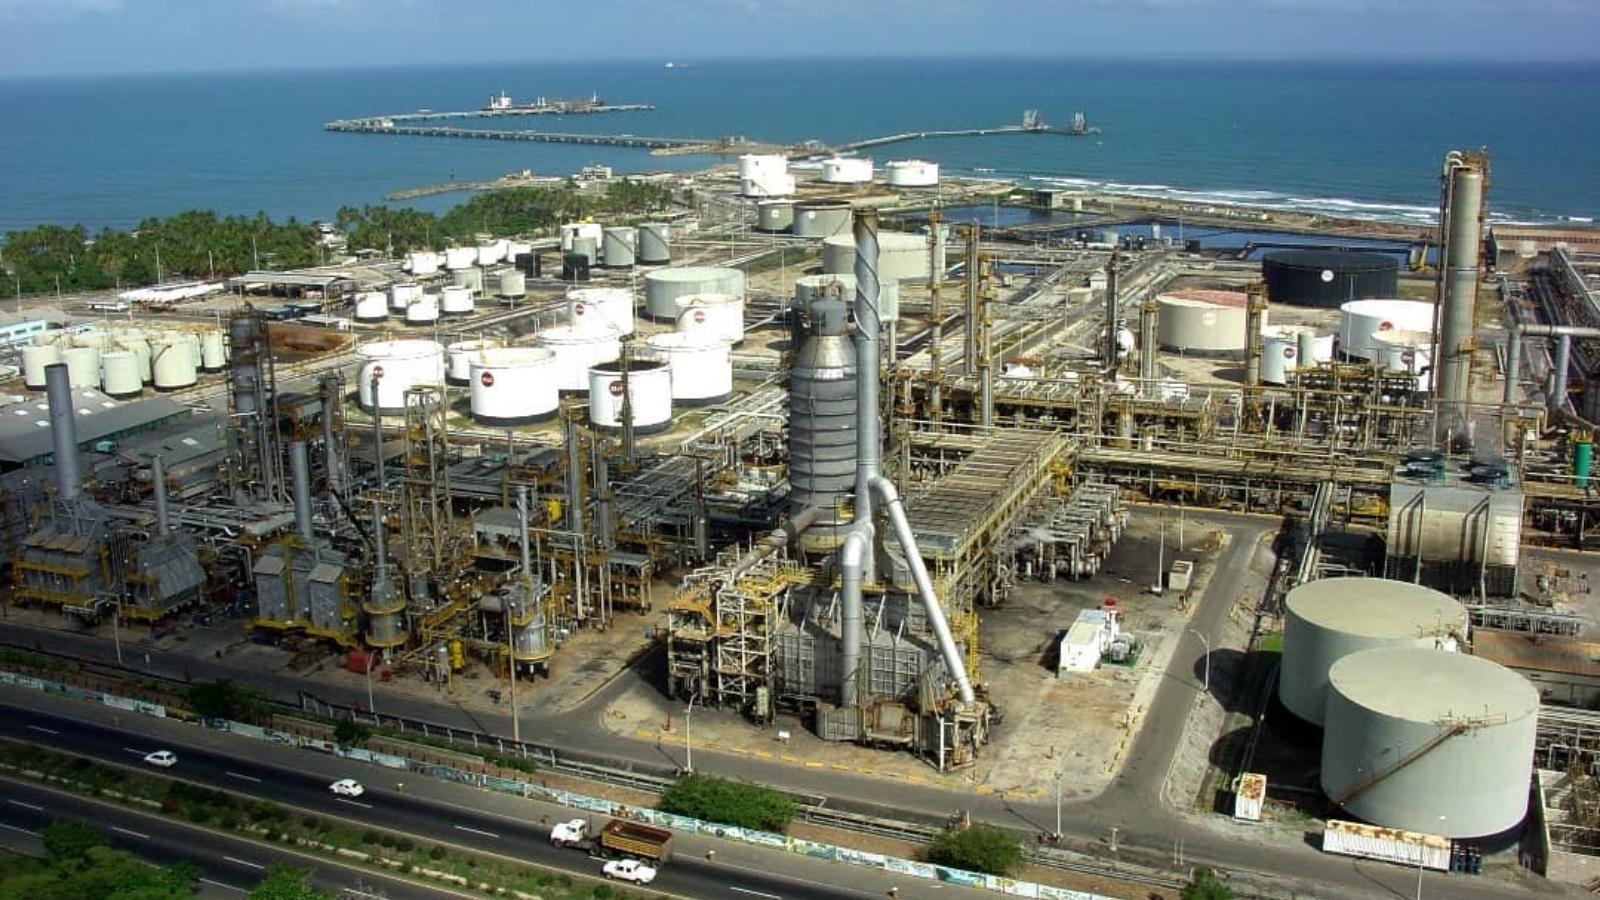 EEUU sanciona a 34 barcos de PDVSA y a dos empresas por enviar crudo a Cuba